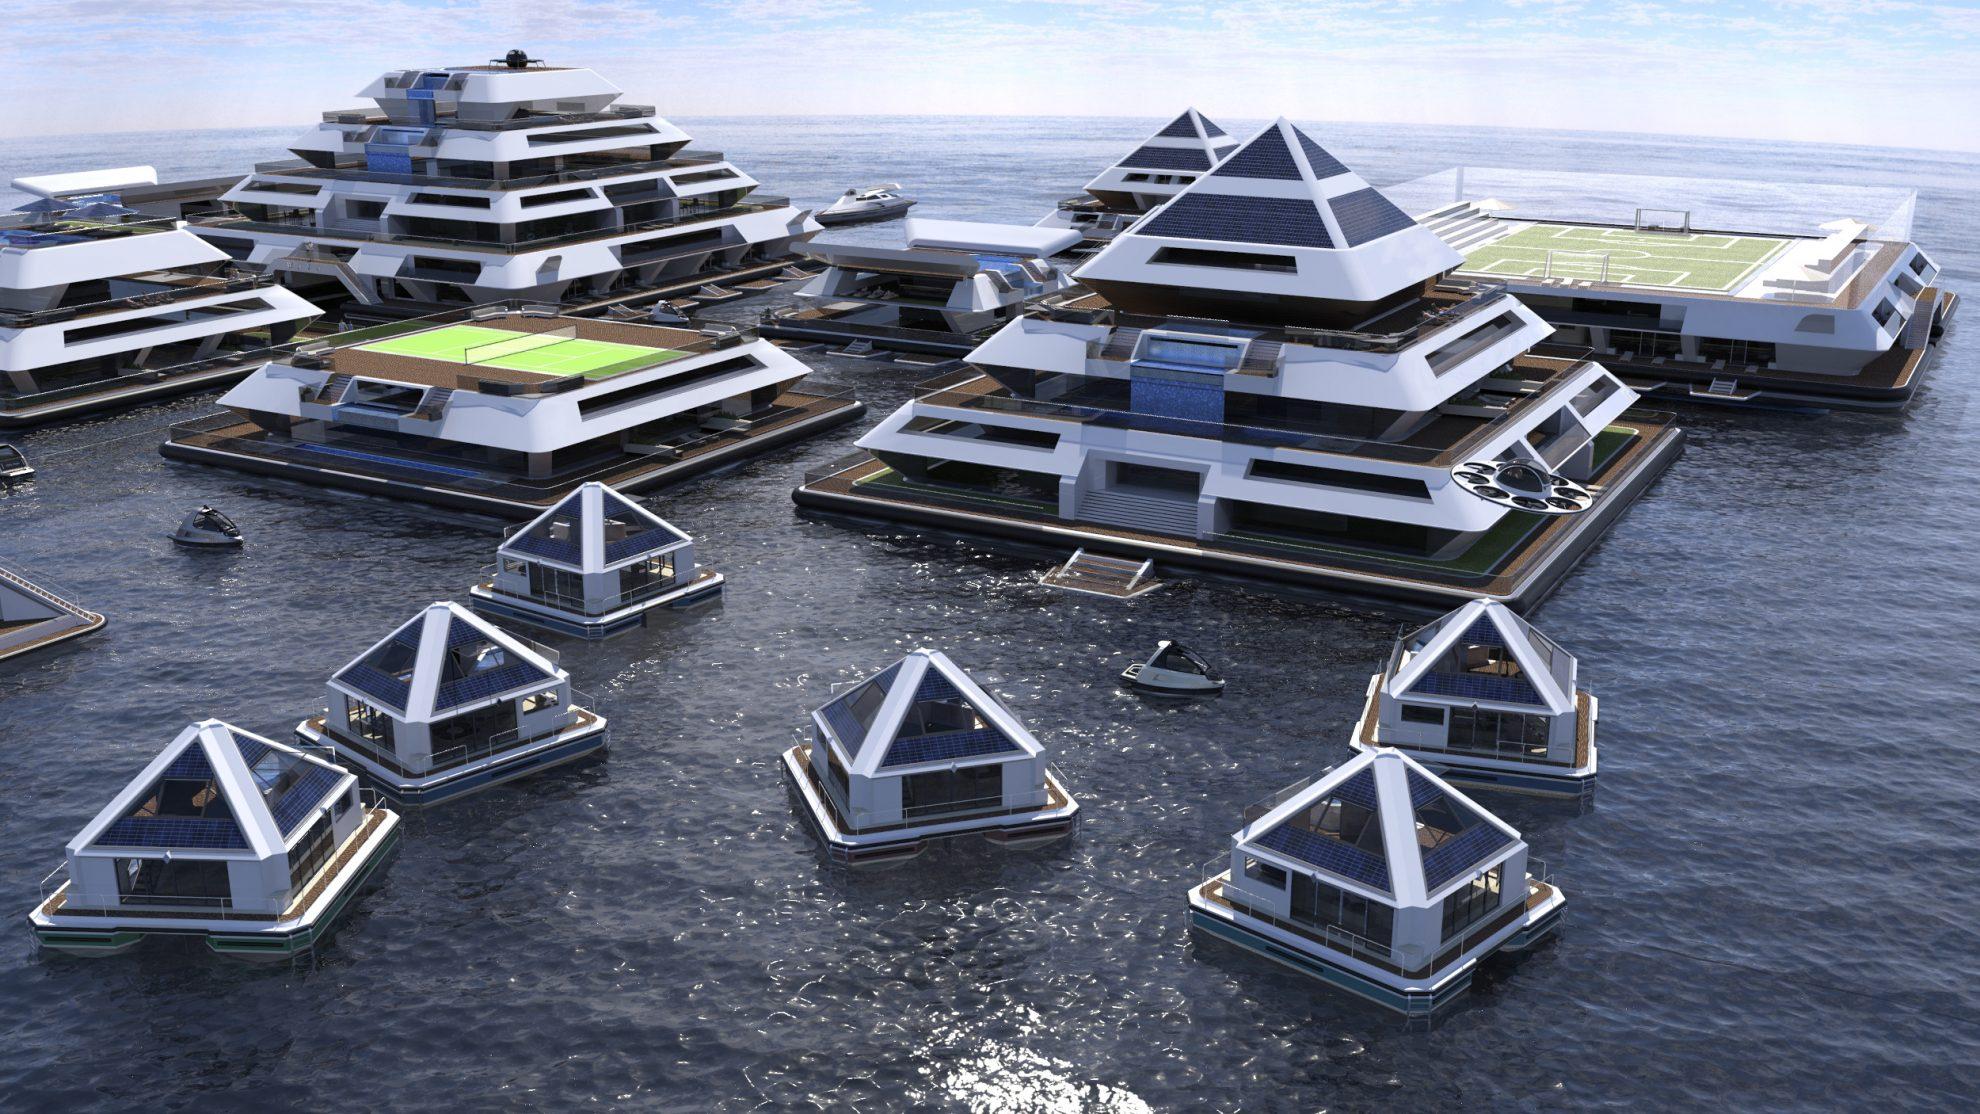 Drijvende piramides